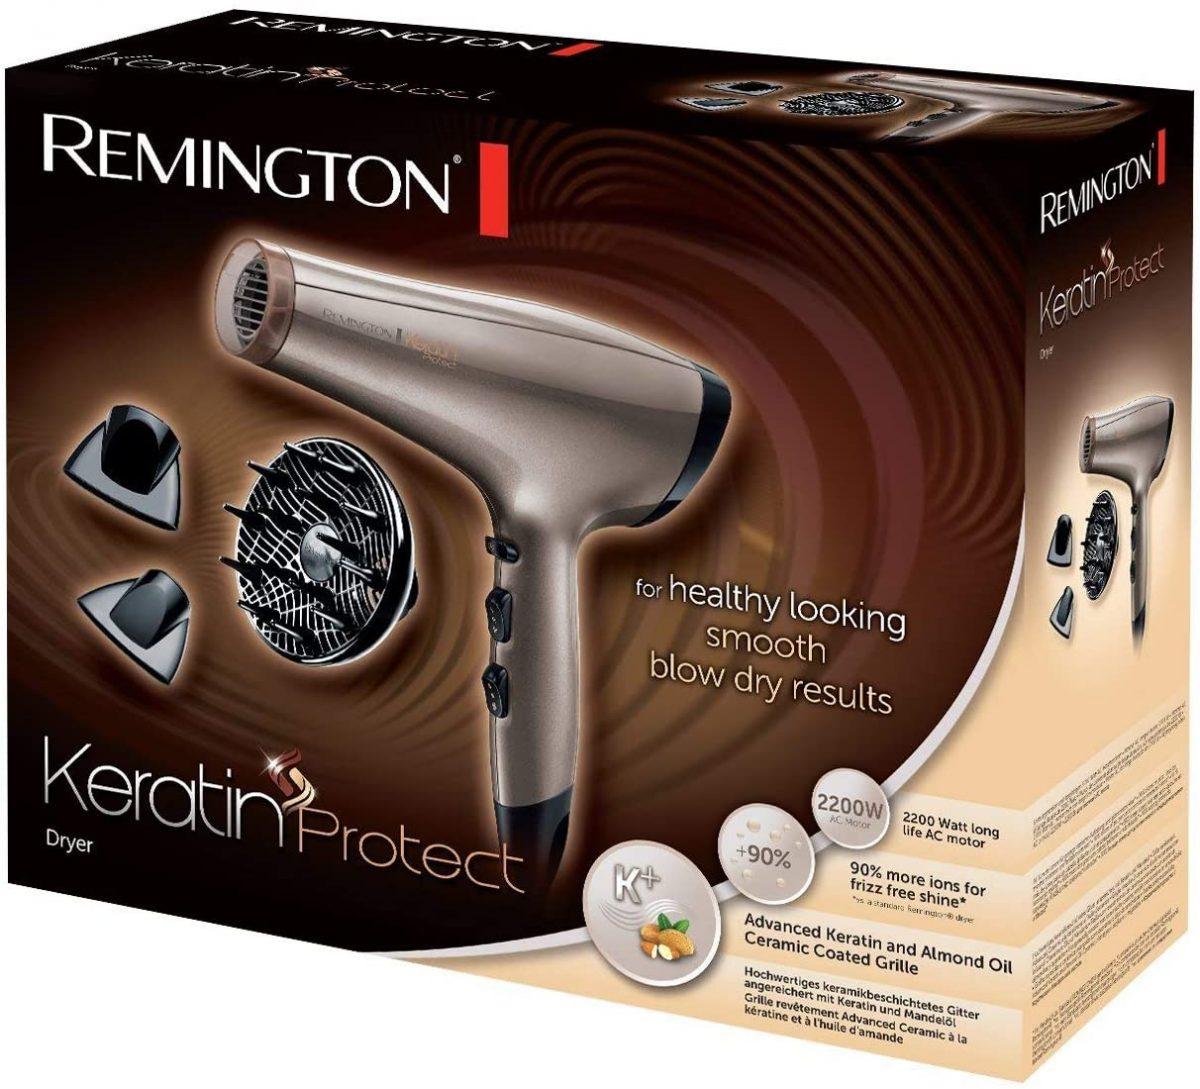 Remington Keratin Protect AC8002 barato scaled SuperChollos